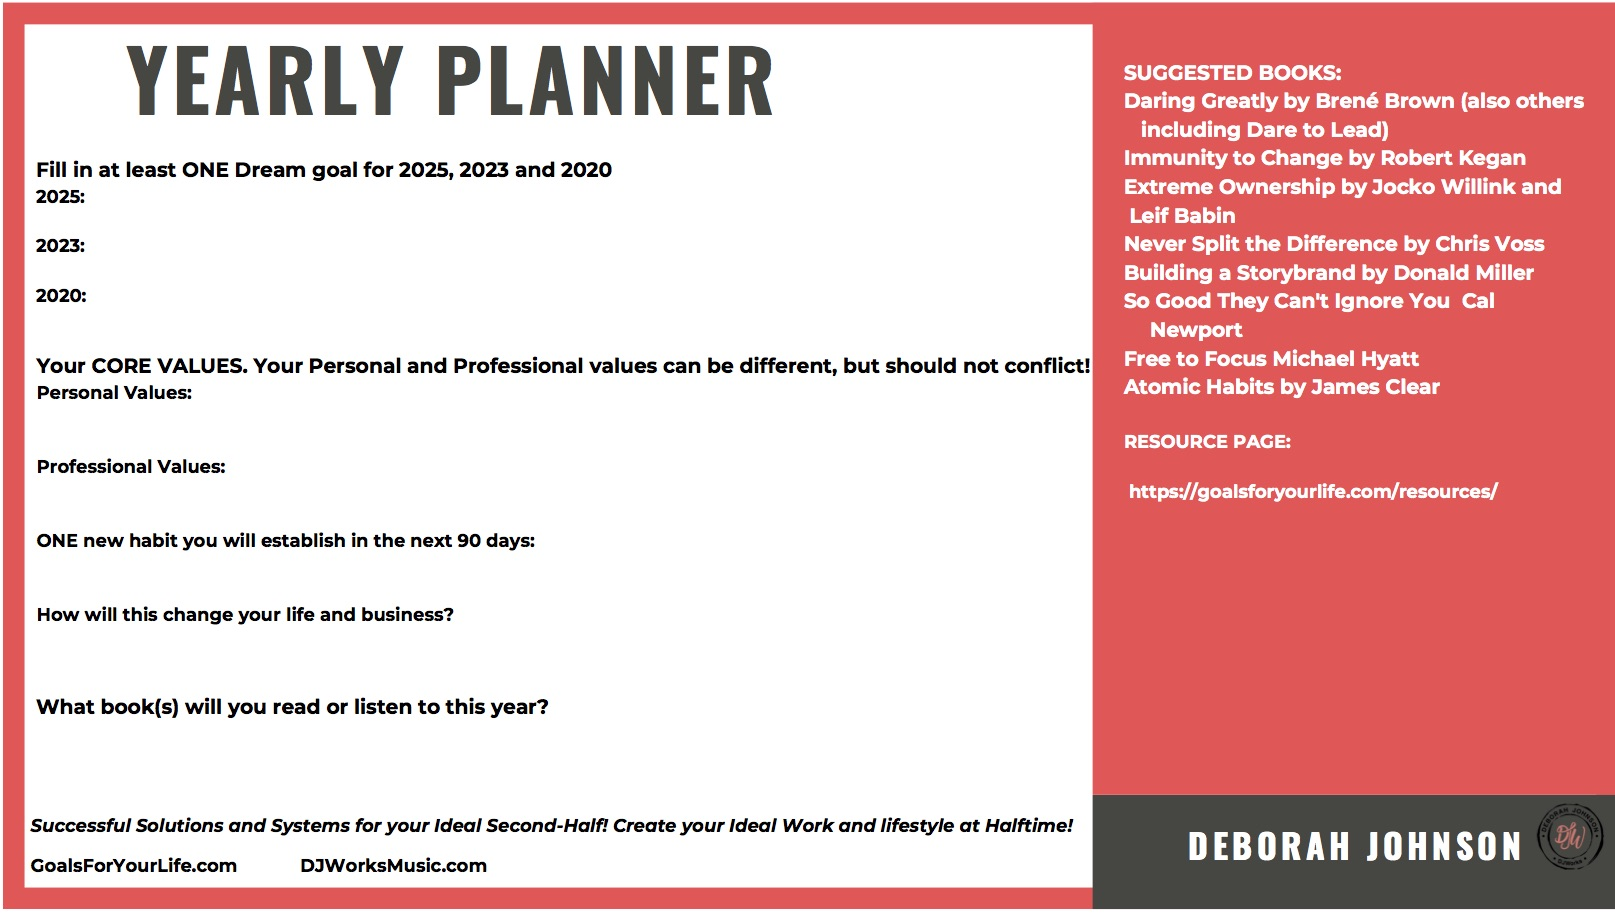 Yearly Planner-Deborah Johnson